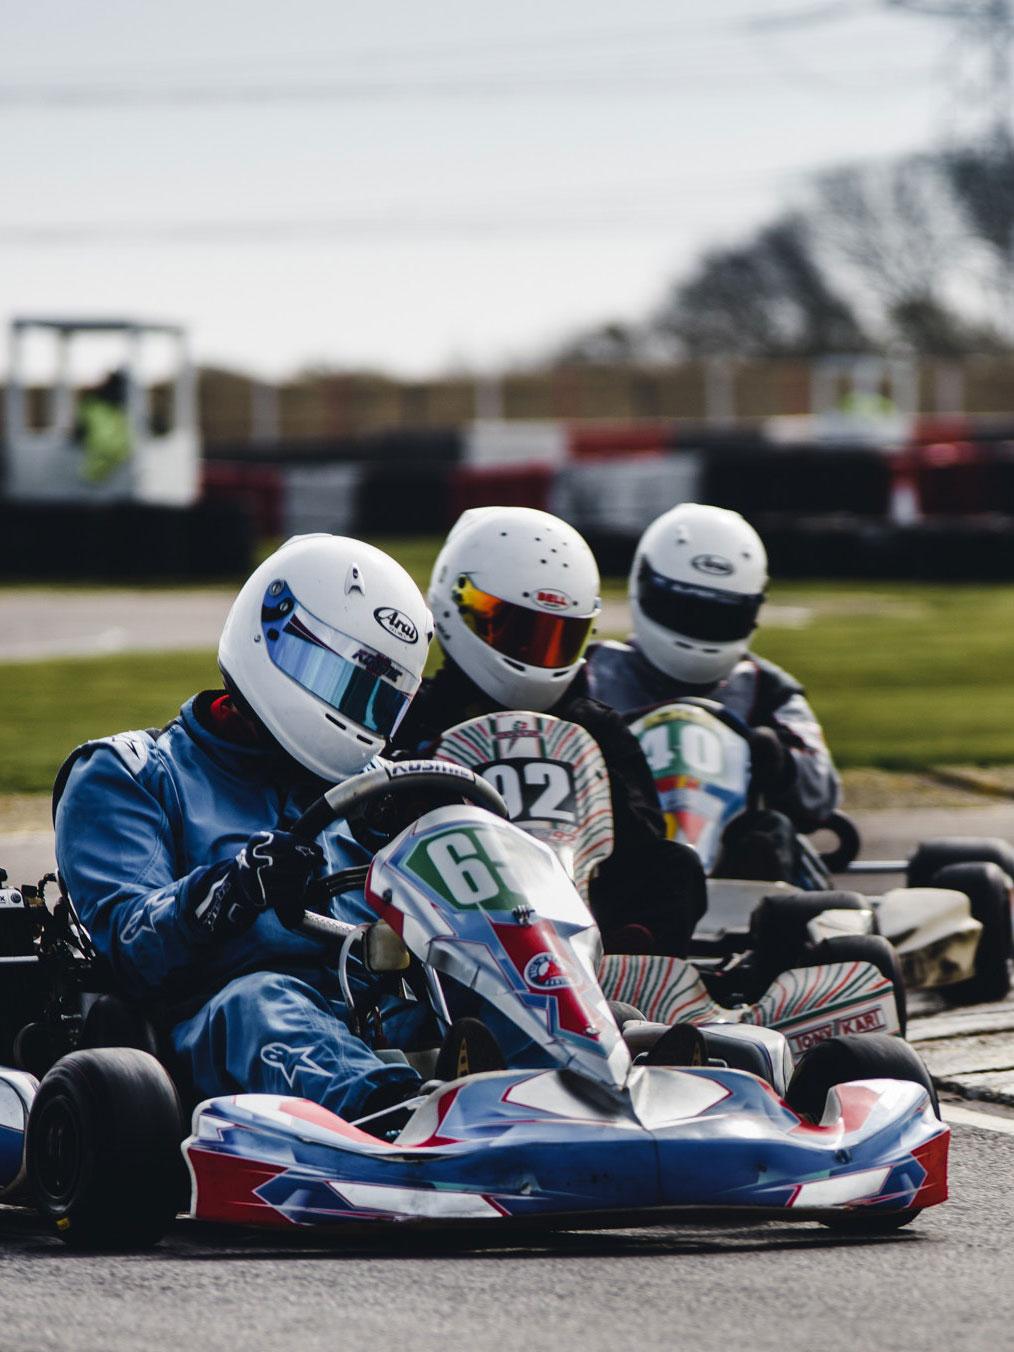 Karts Aller Klassen Finden Anbieten Motorsportmarktde Seite 3